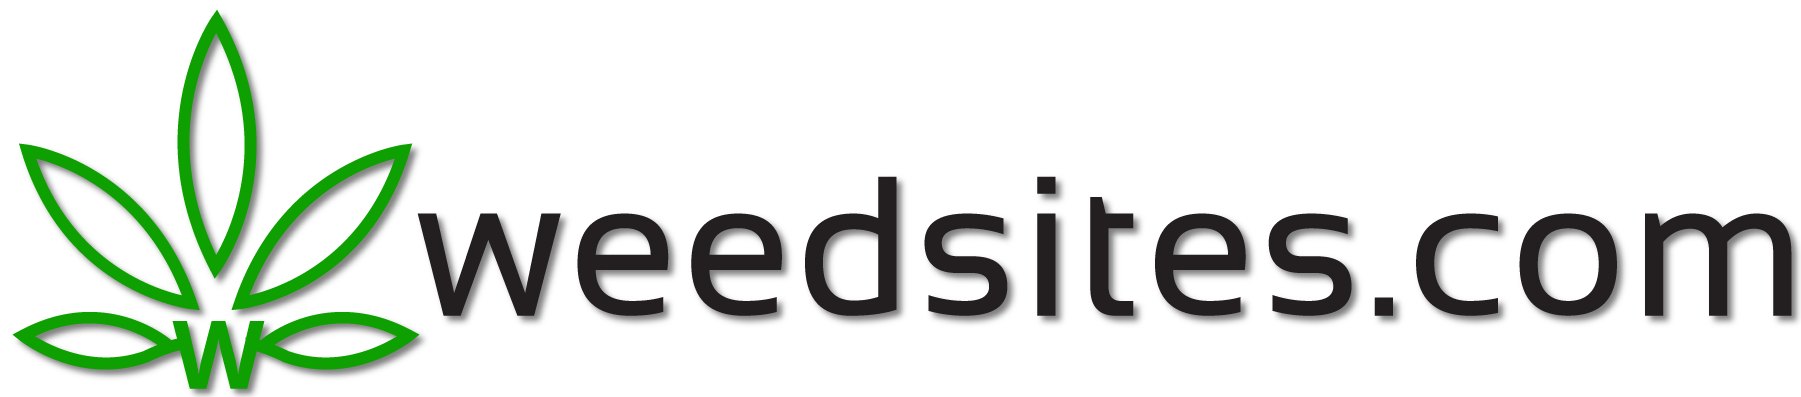 WEEDSITES.COM